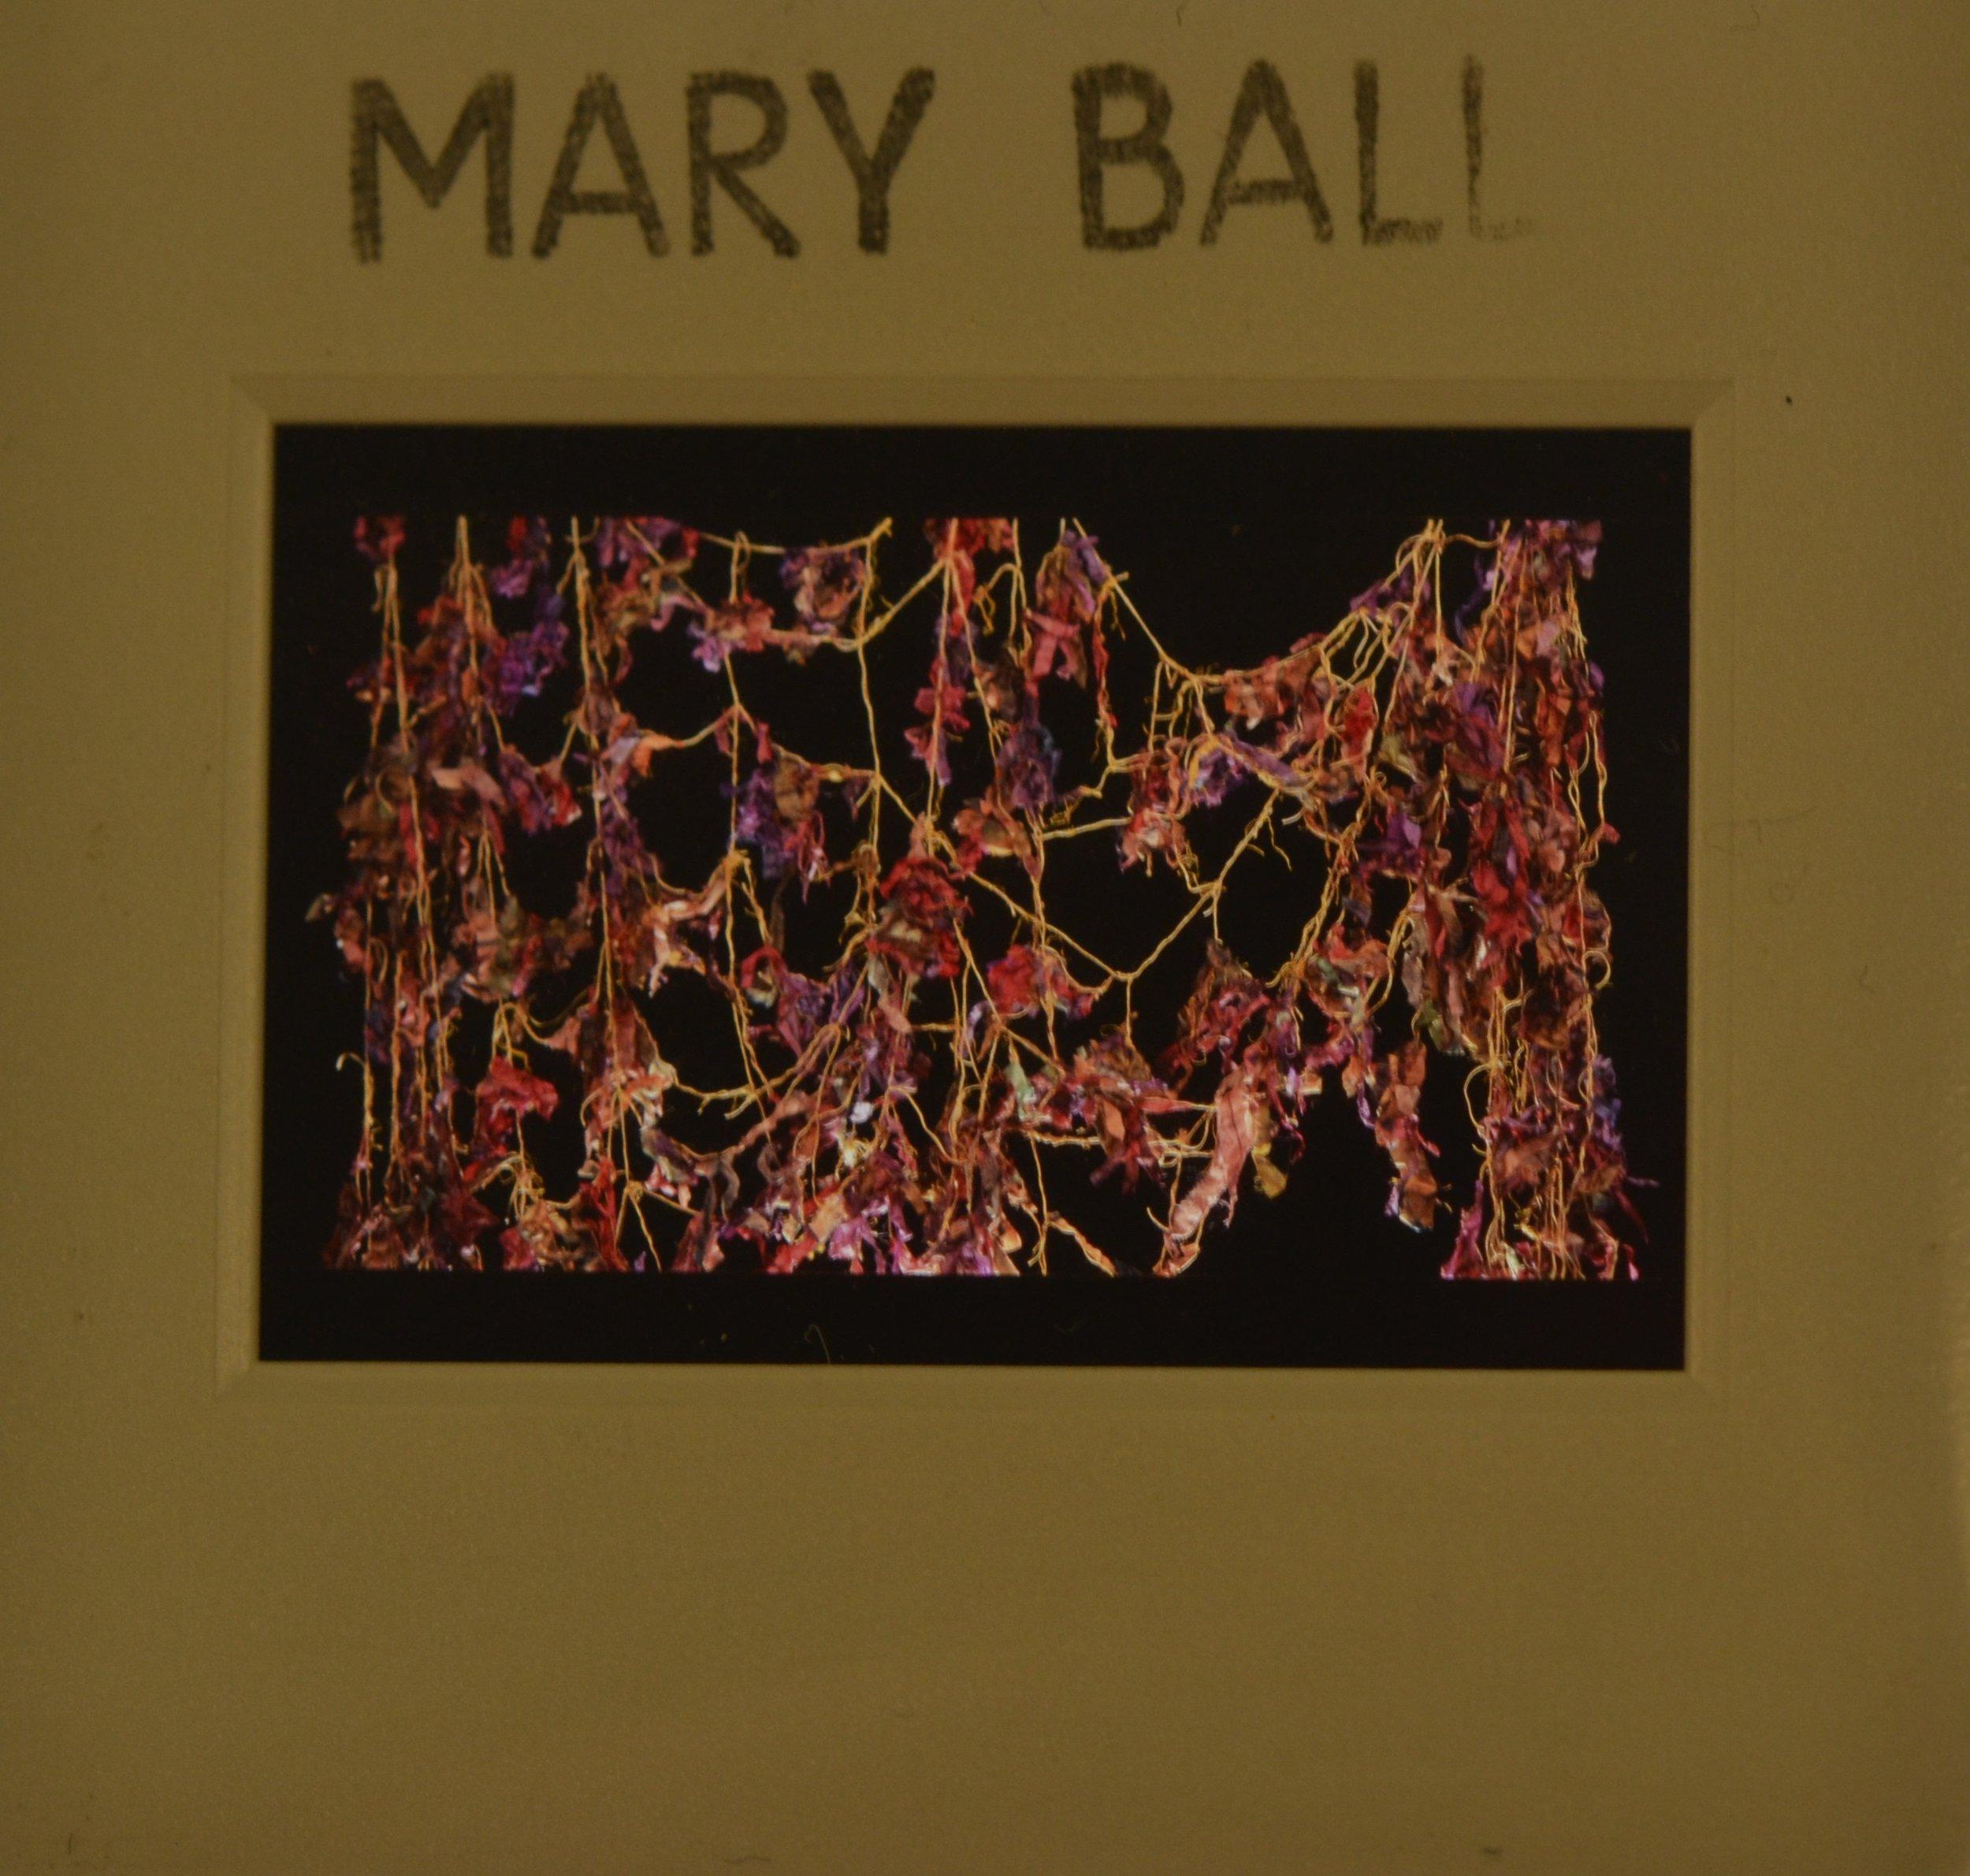 MARY BALL S9.jpg